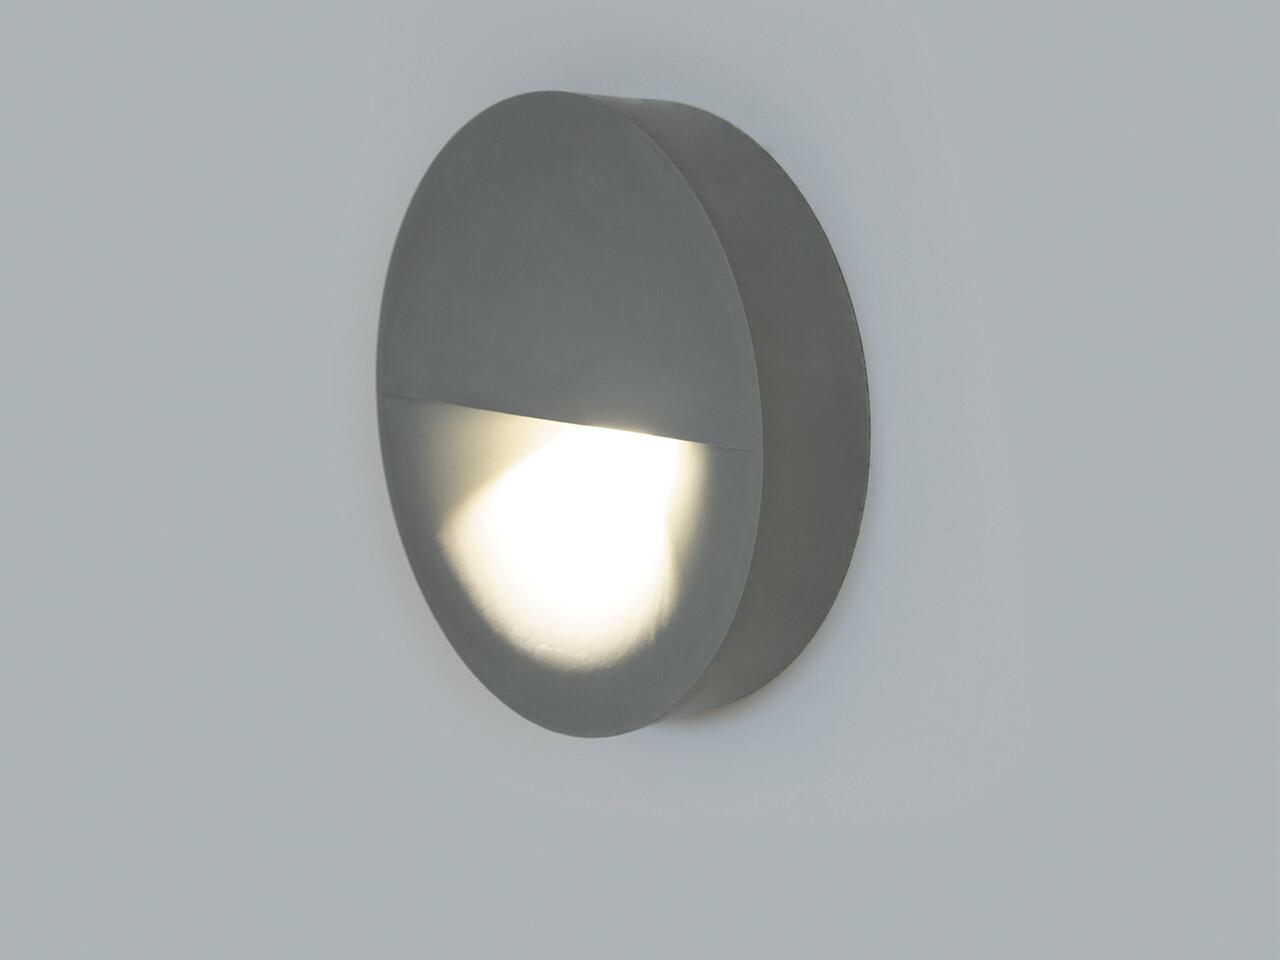 9010 Wandleuchte LEVICO LED 10W, IP65, schwarz